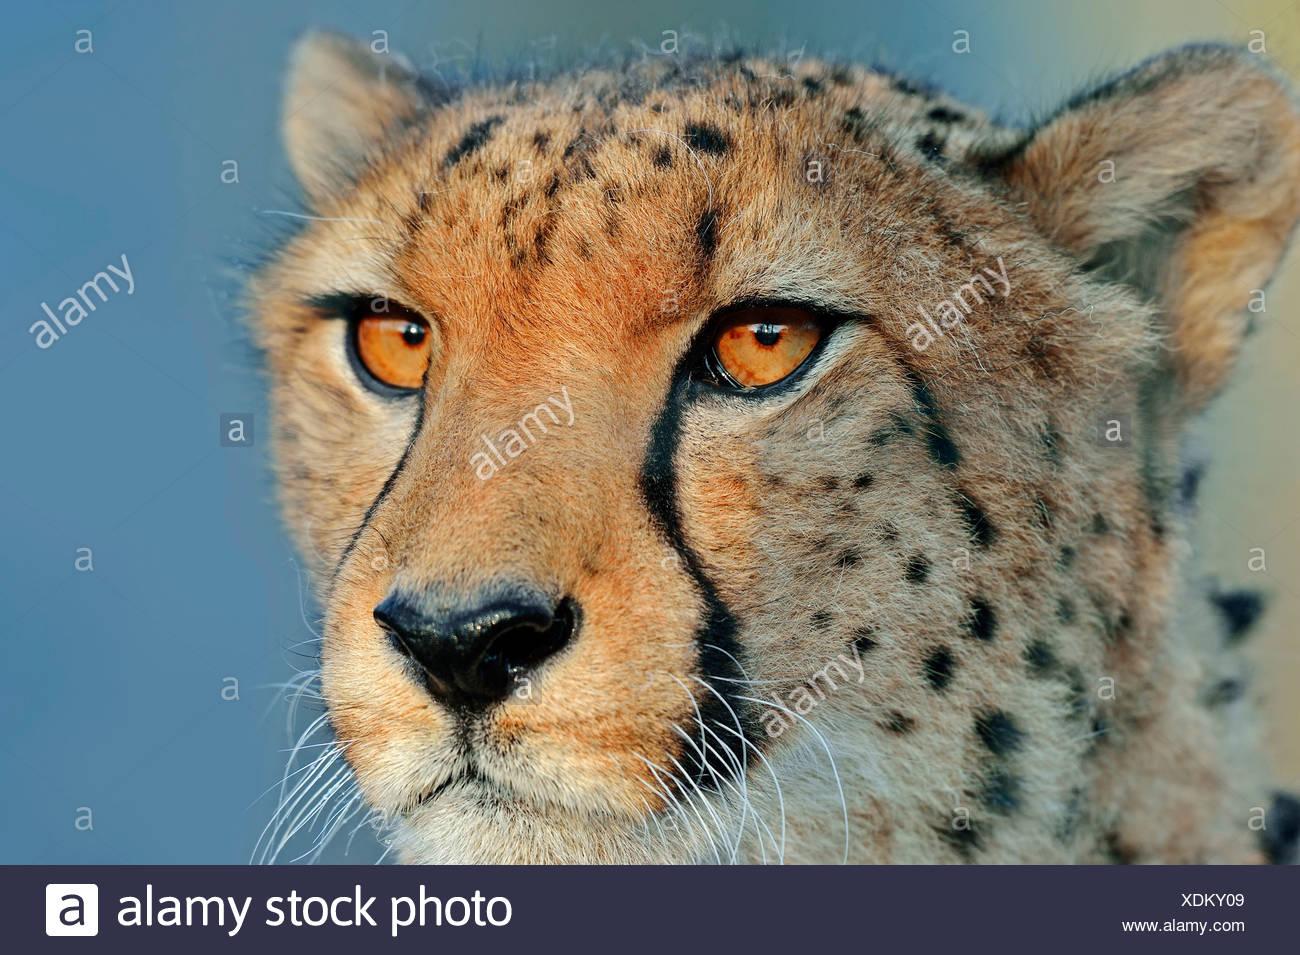 Cheetah (Acinonyx jubatus), portrait, native to Africa, in captivity - Stock Image